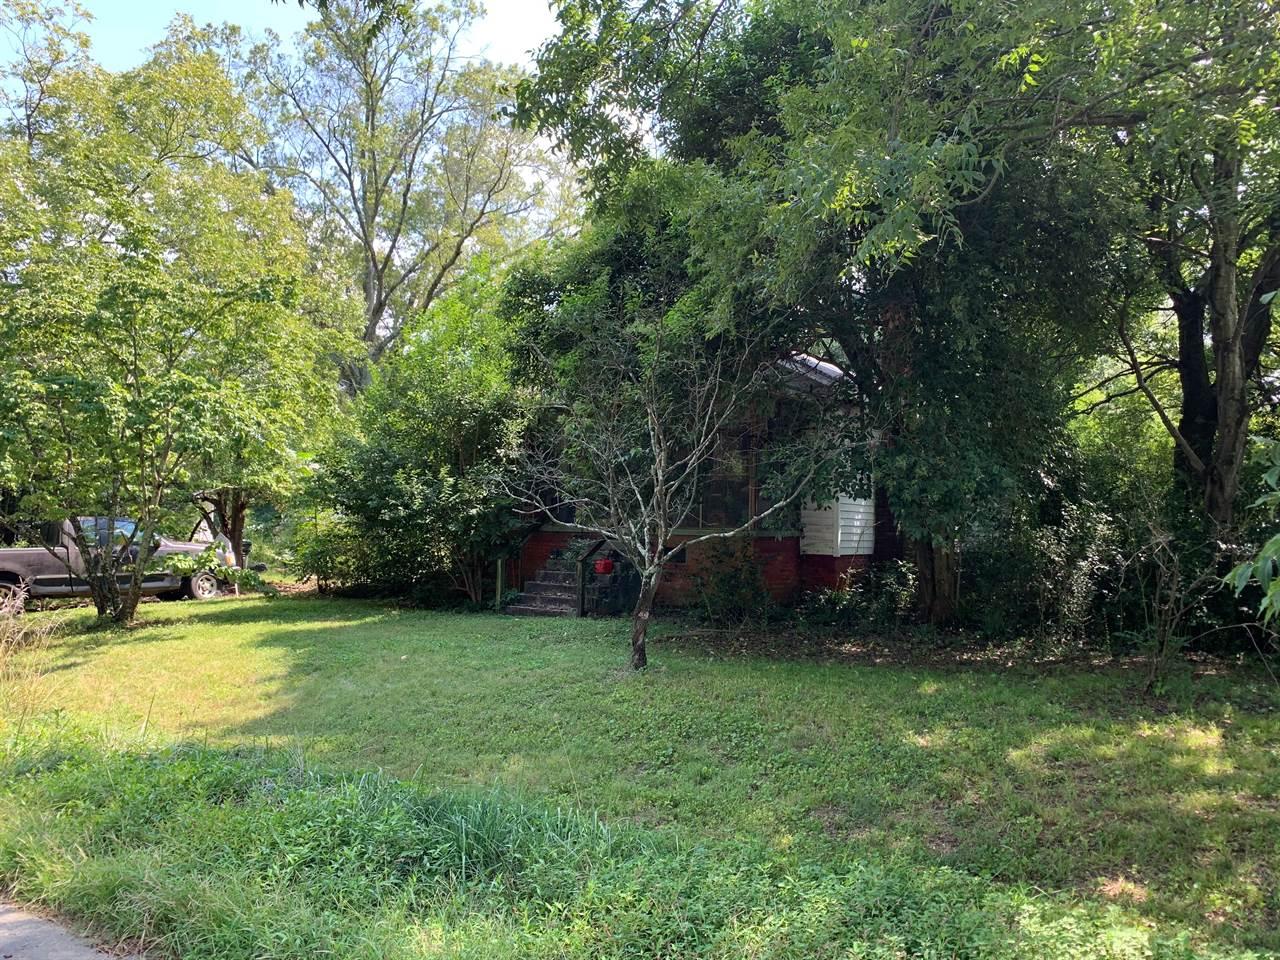 41 Dulin, Concord, NC 28027